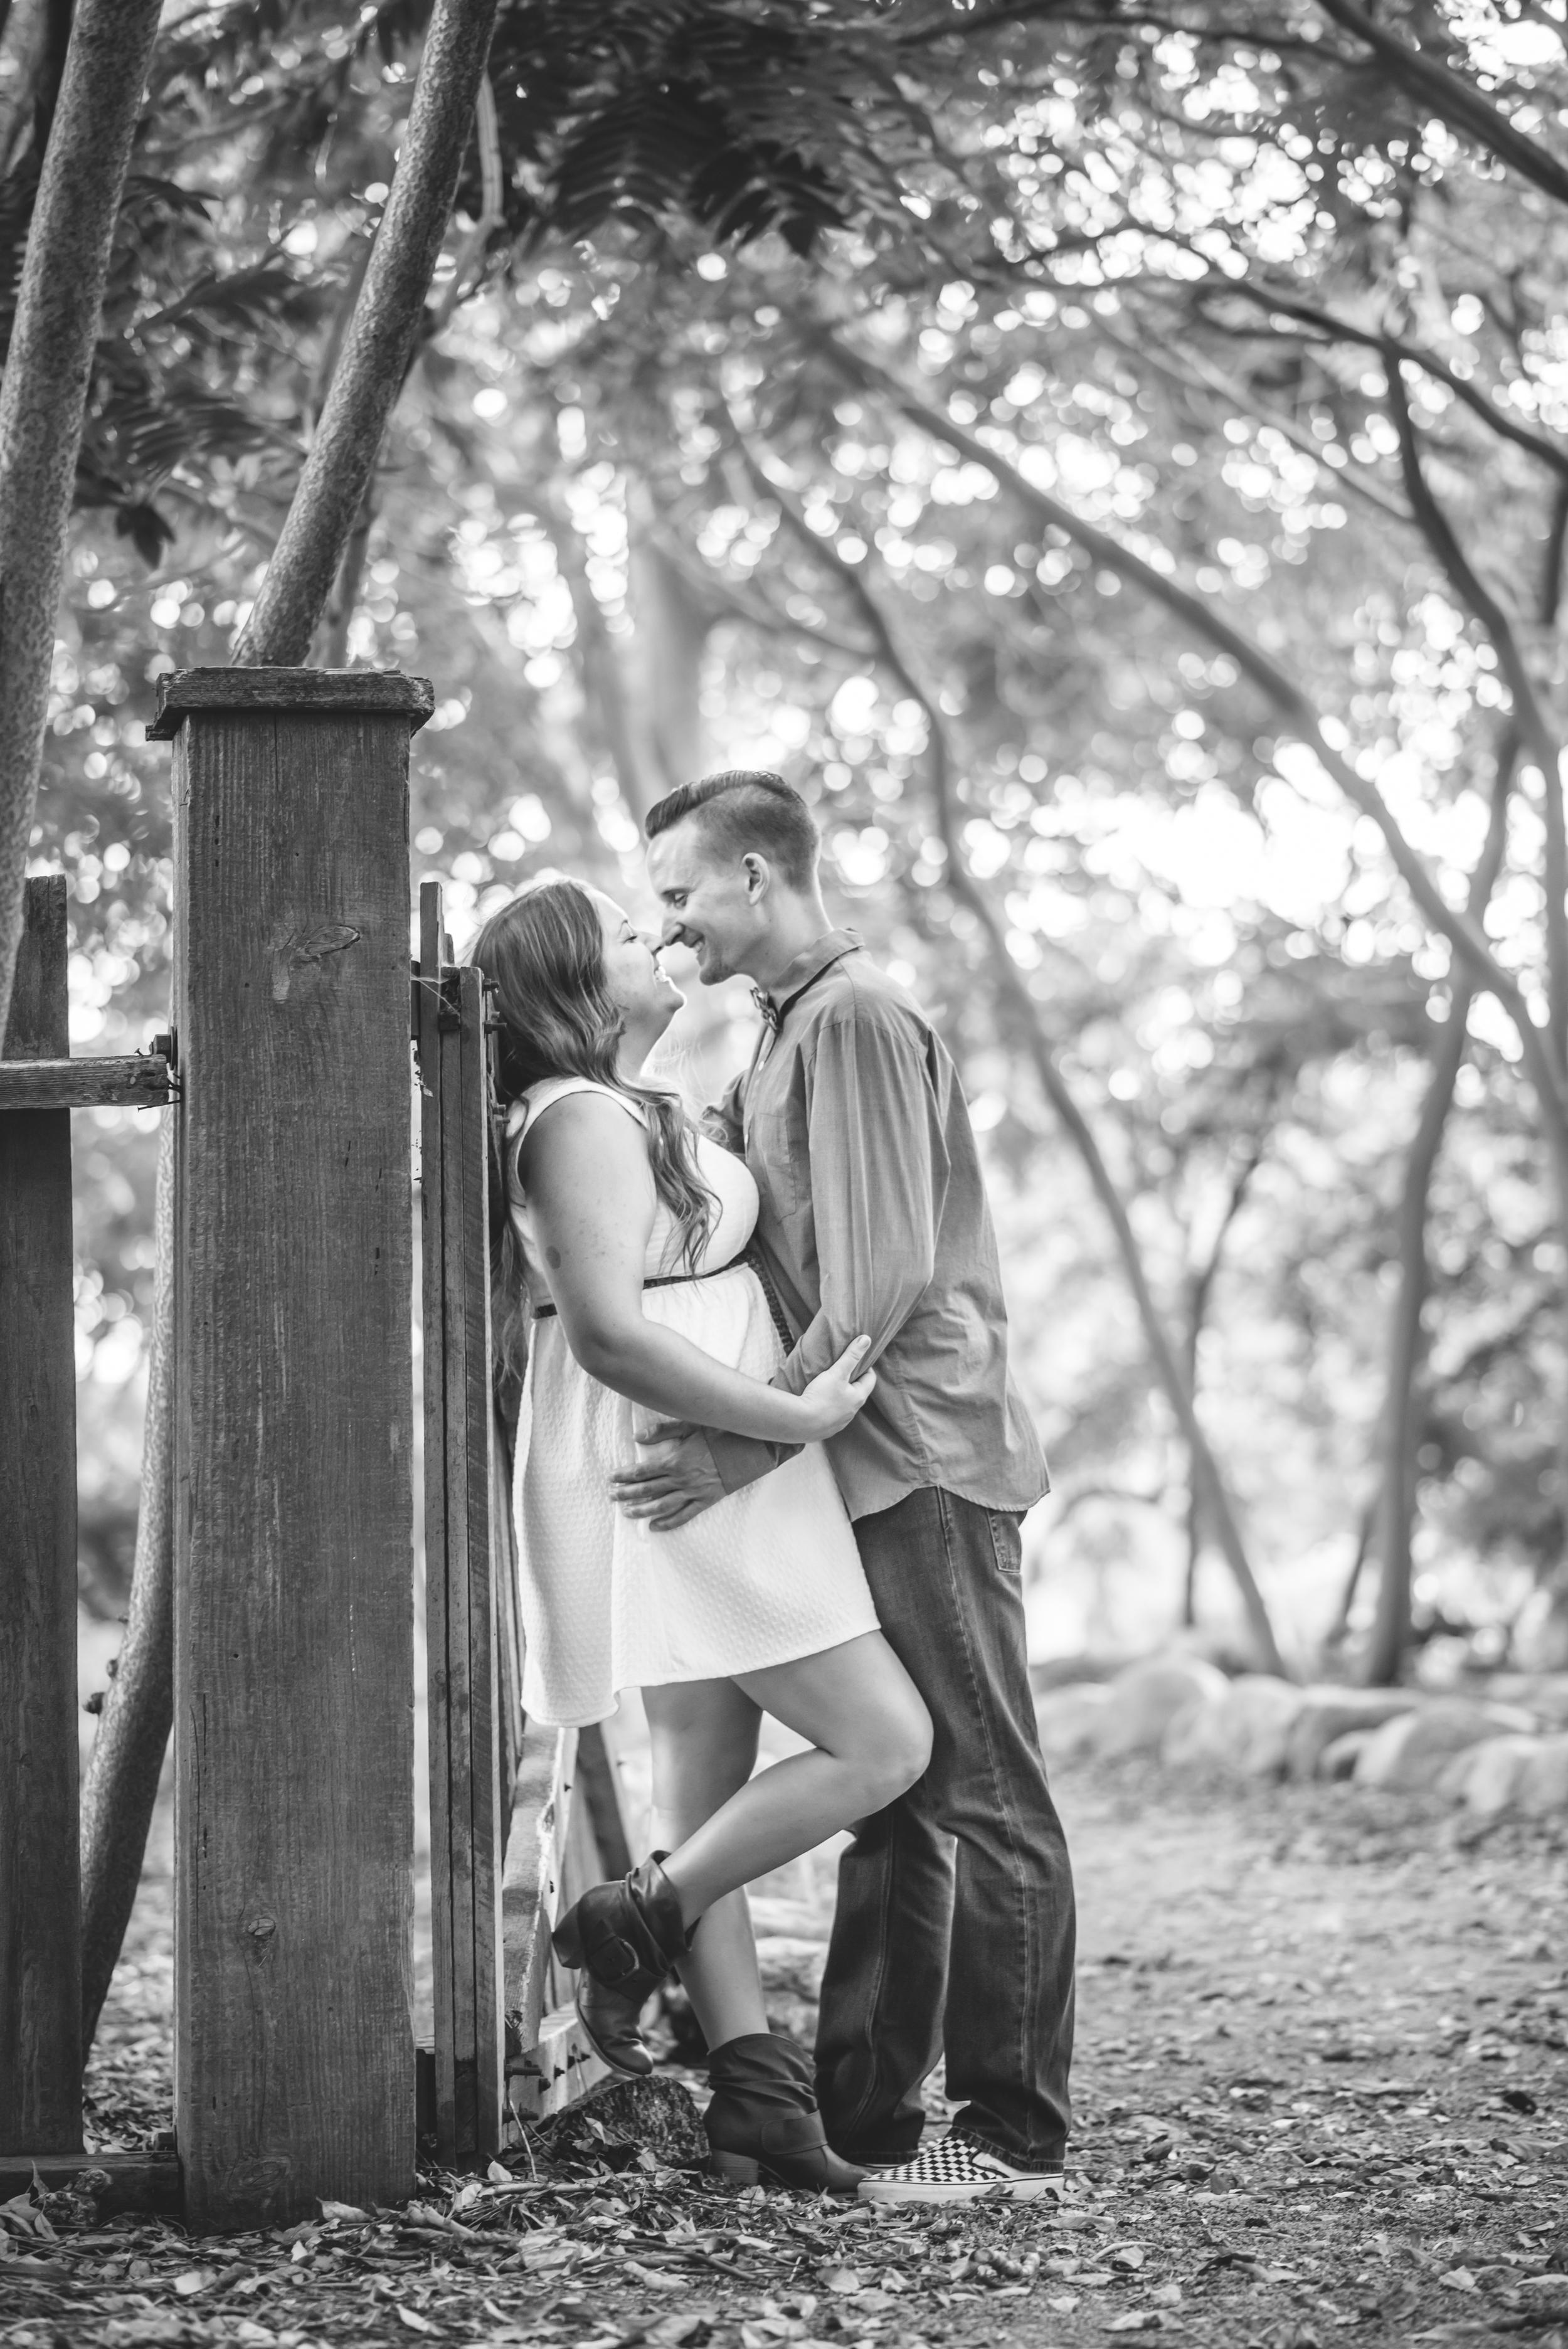 Ayren and Curtis' Engagement photos in Claremont California